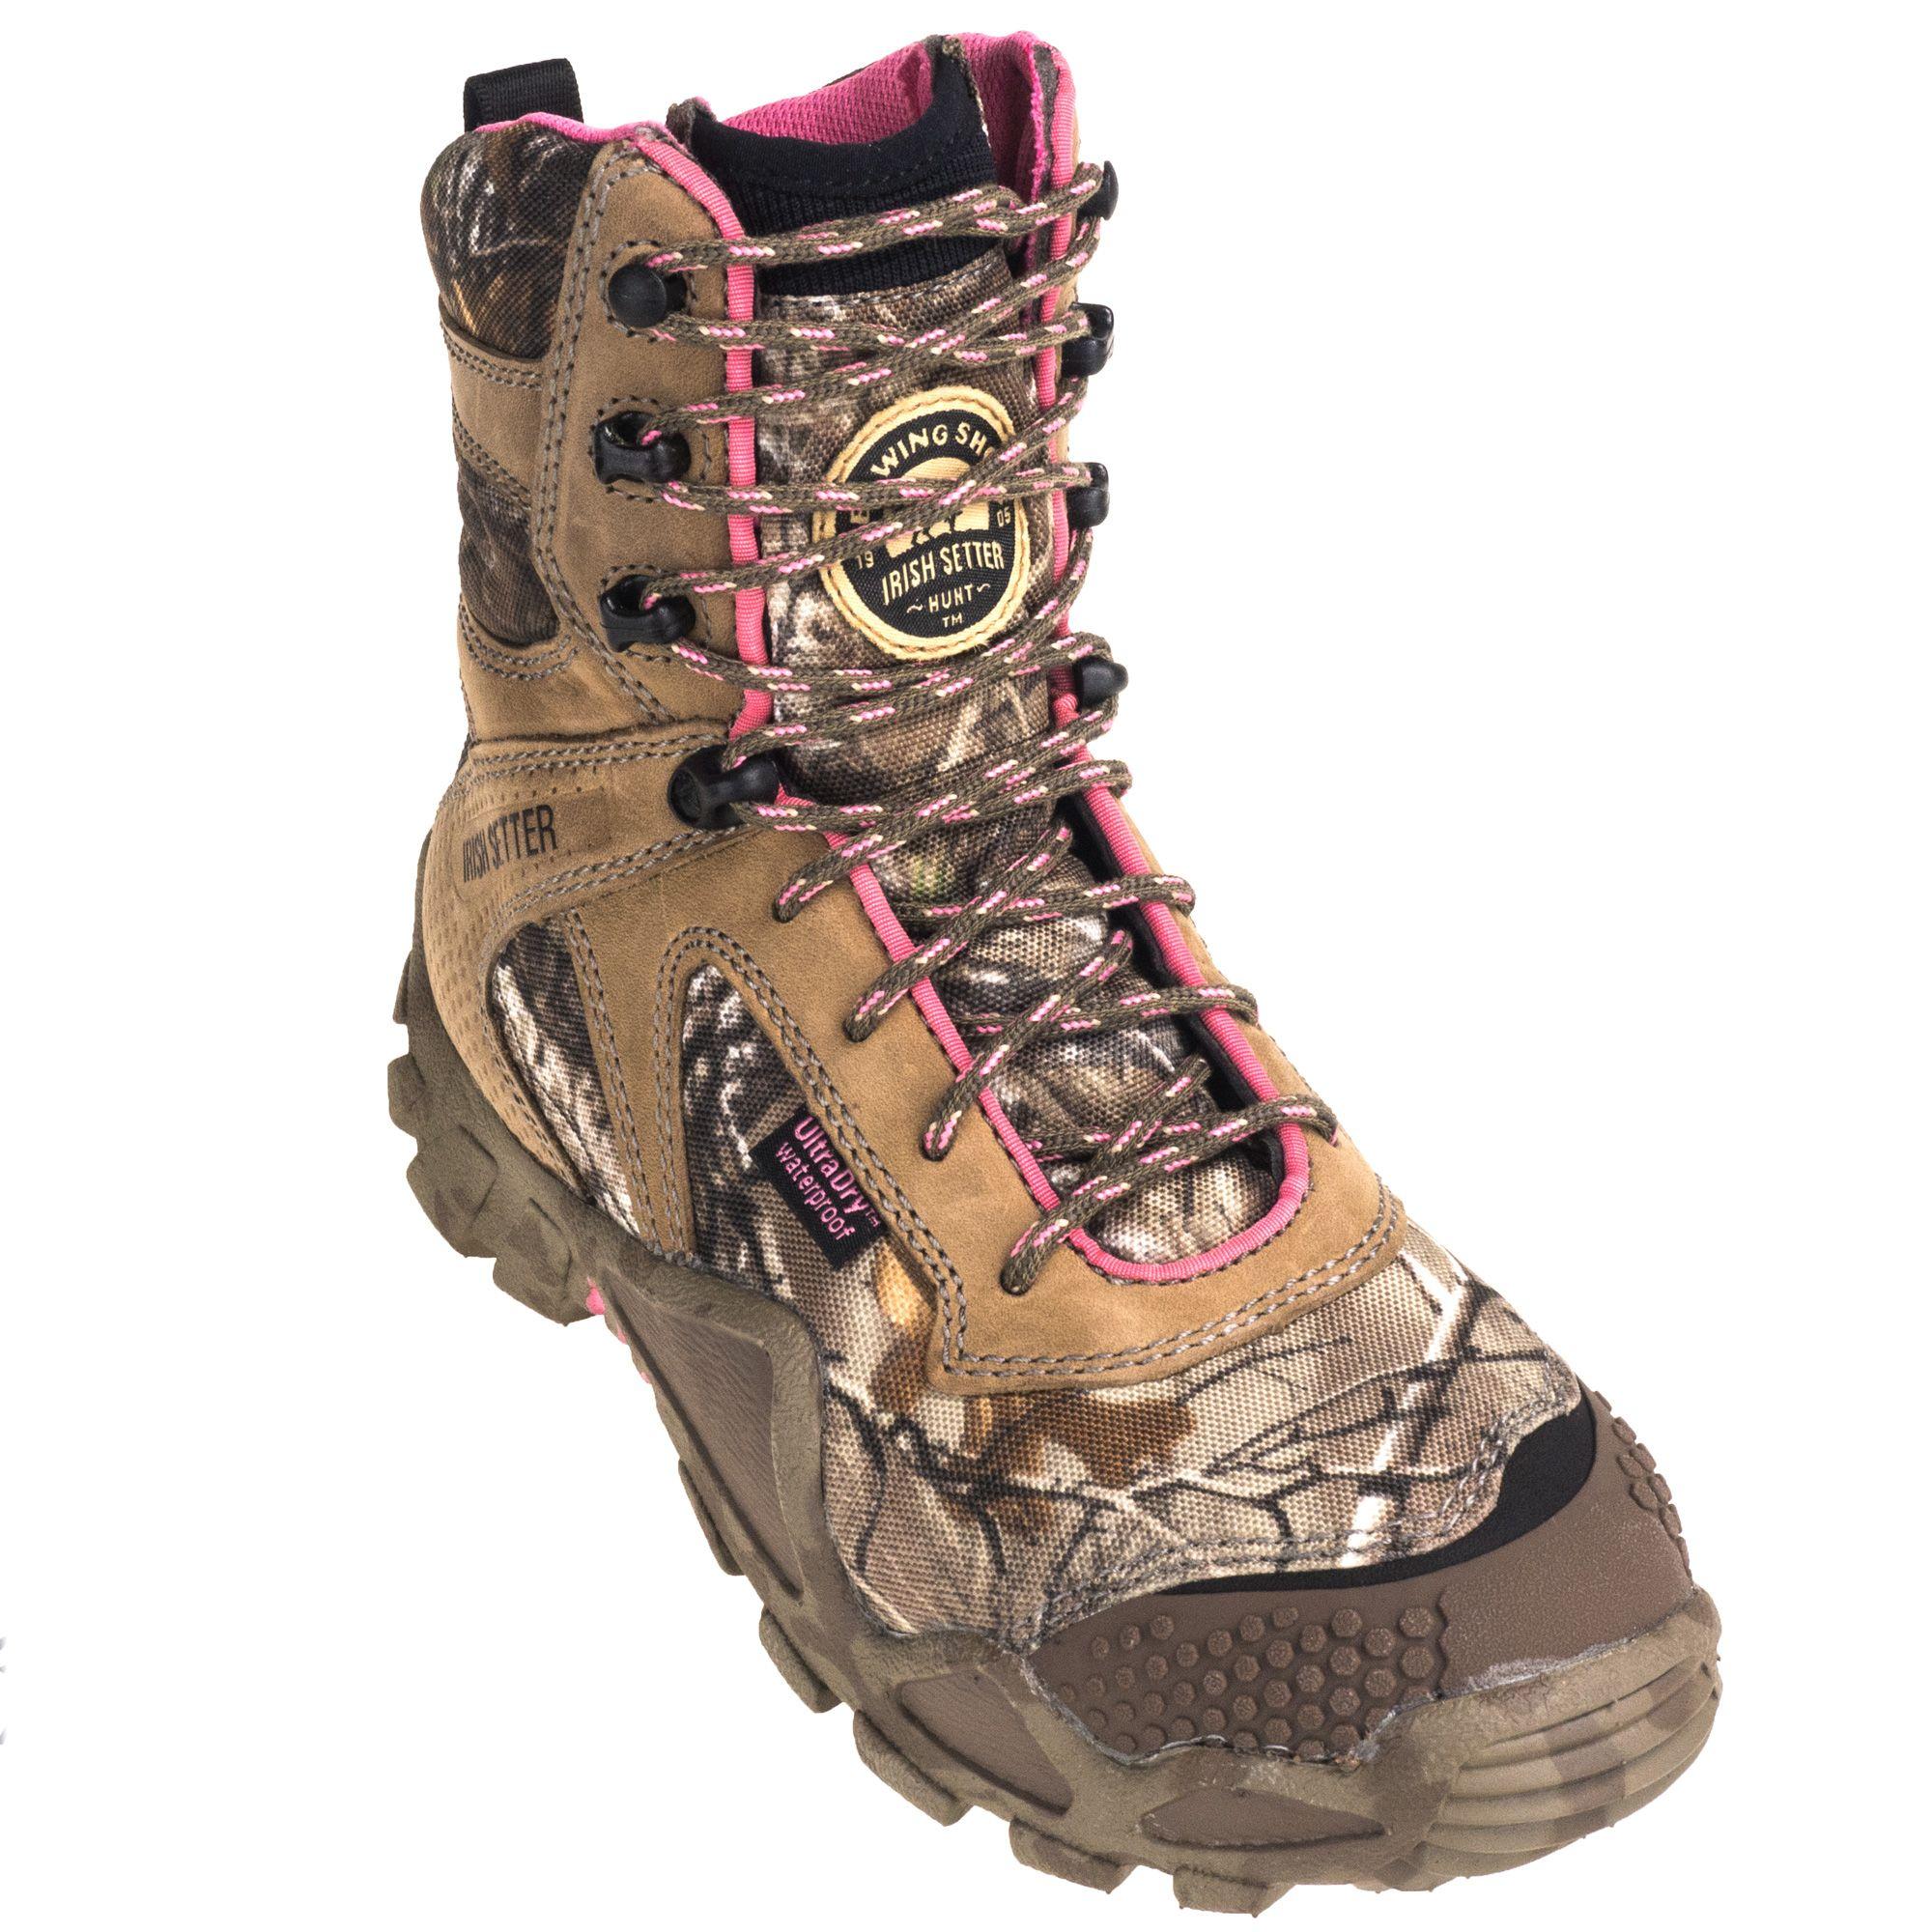 7c8bcf4e8ef Irish Setter Boots Women's 2862 Waterproof 8-Inch Hunting Camo ...